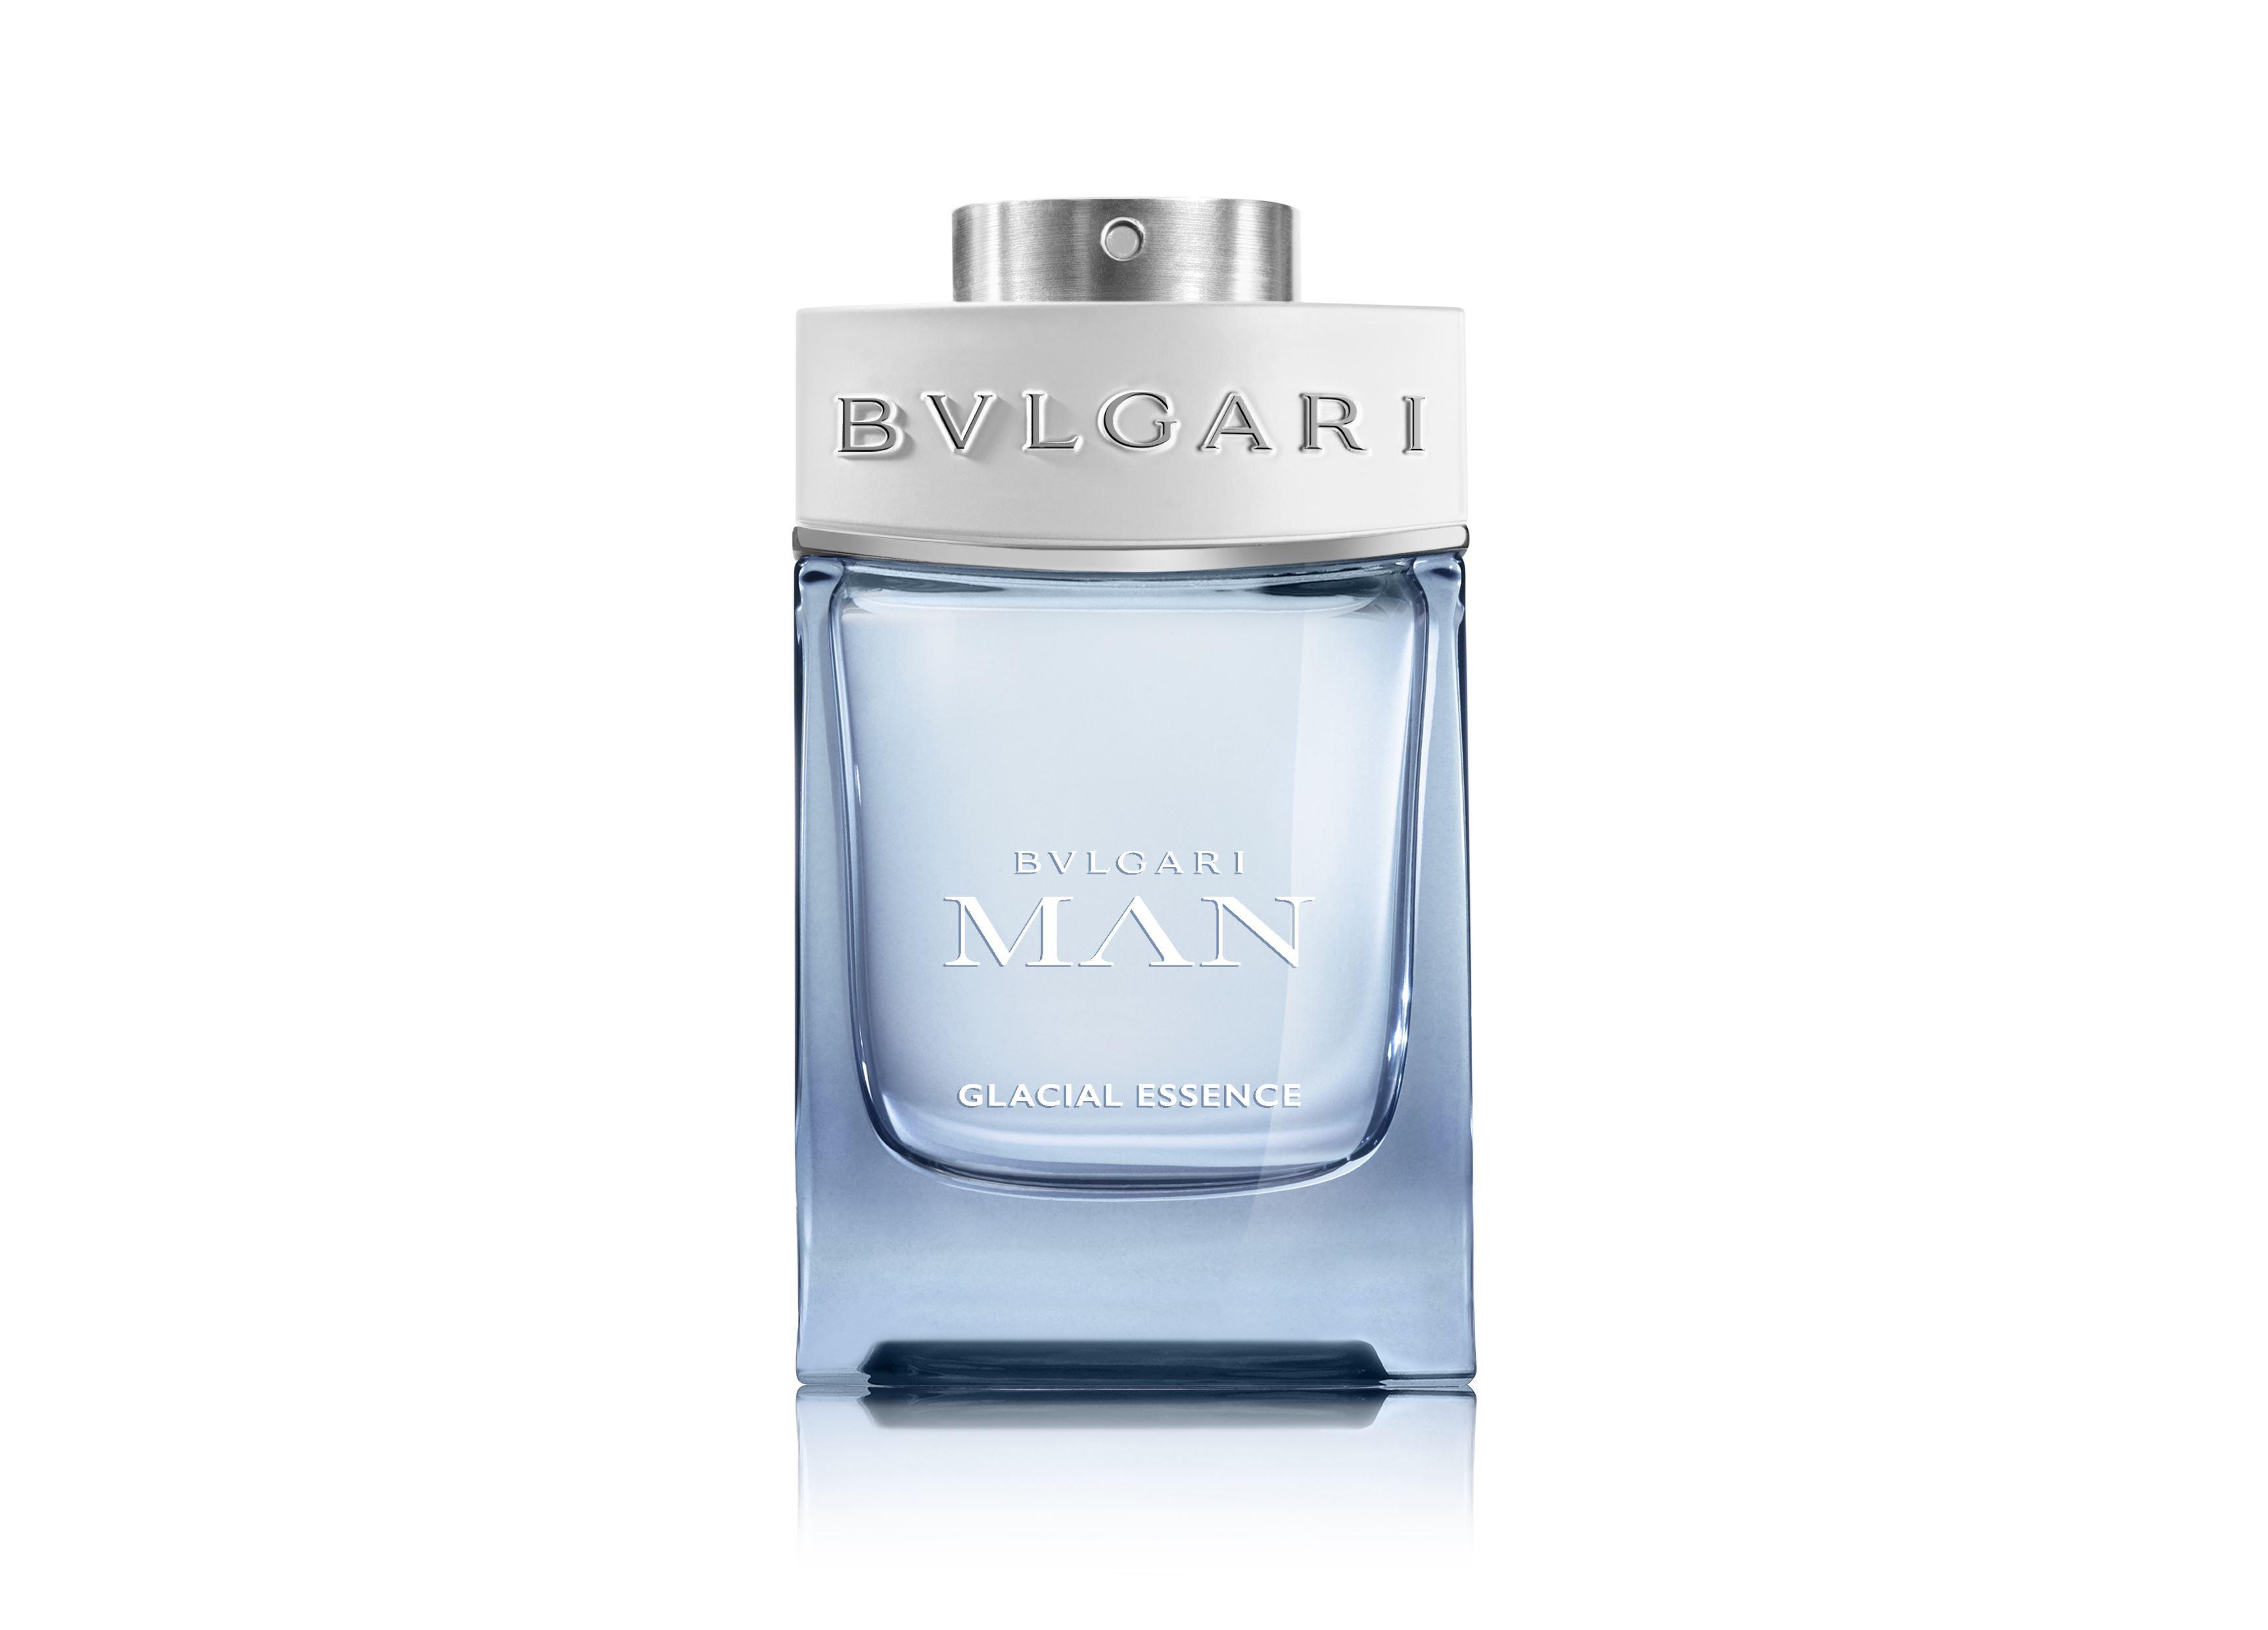 Bvlgari | Bvlgari Man Glacial Essence Eau de Parfum 100ml